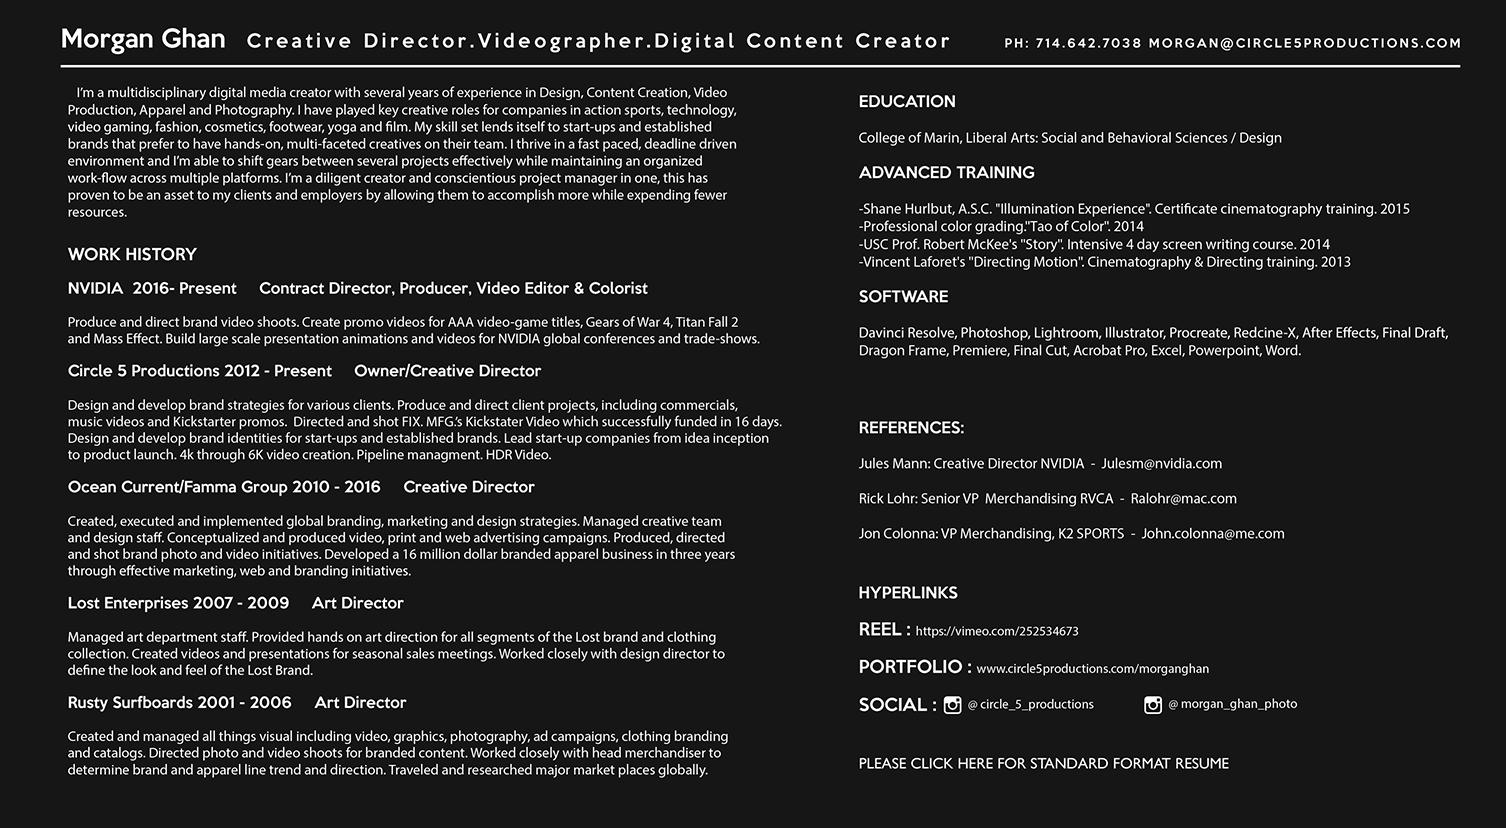 resume circle 5 productions